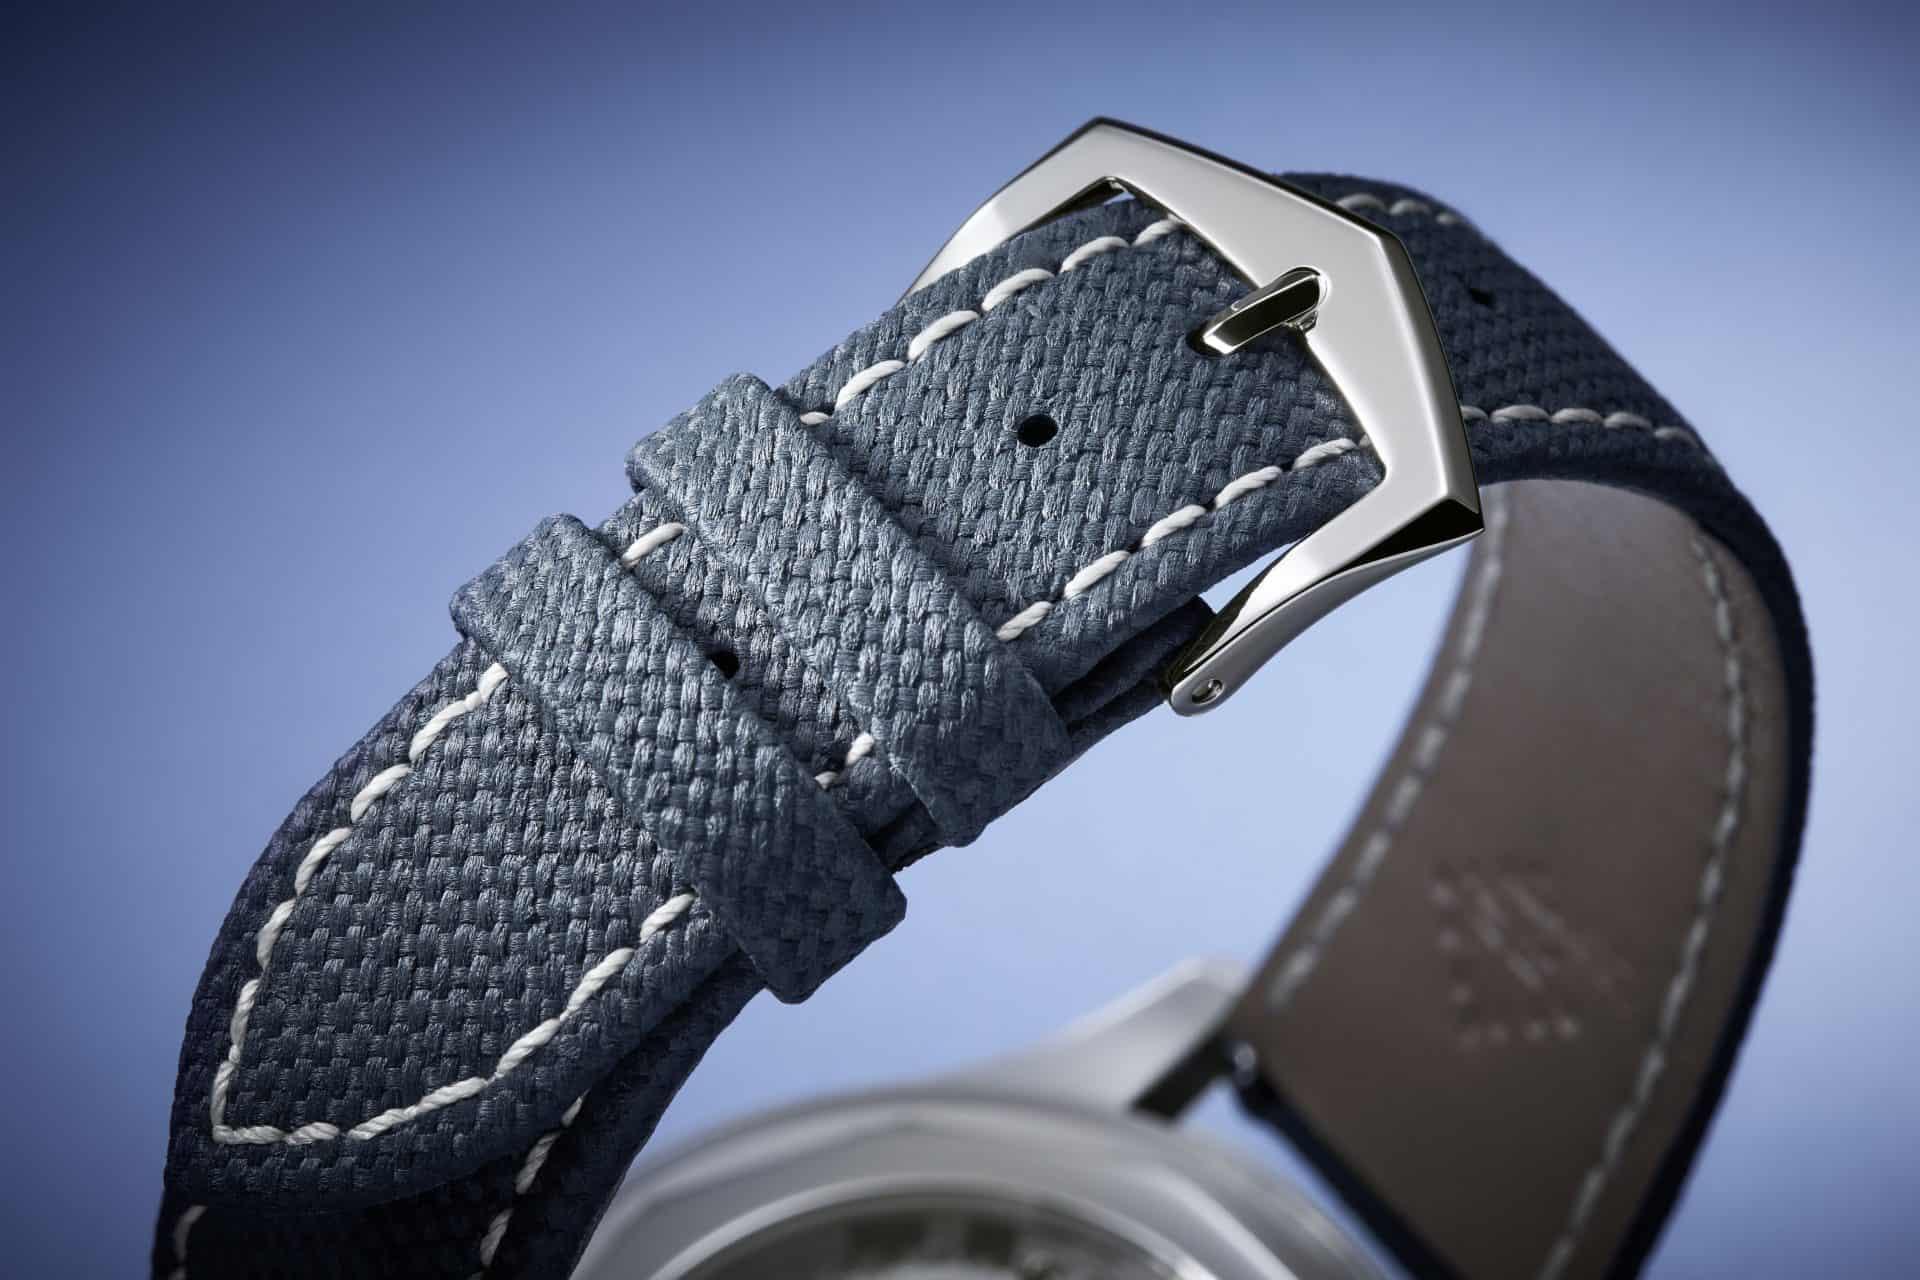 Das Armband ist kein textiles Material, sondern geprägtes Kalbsleder